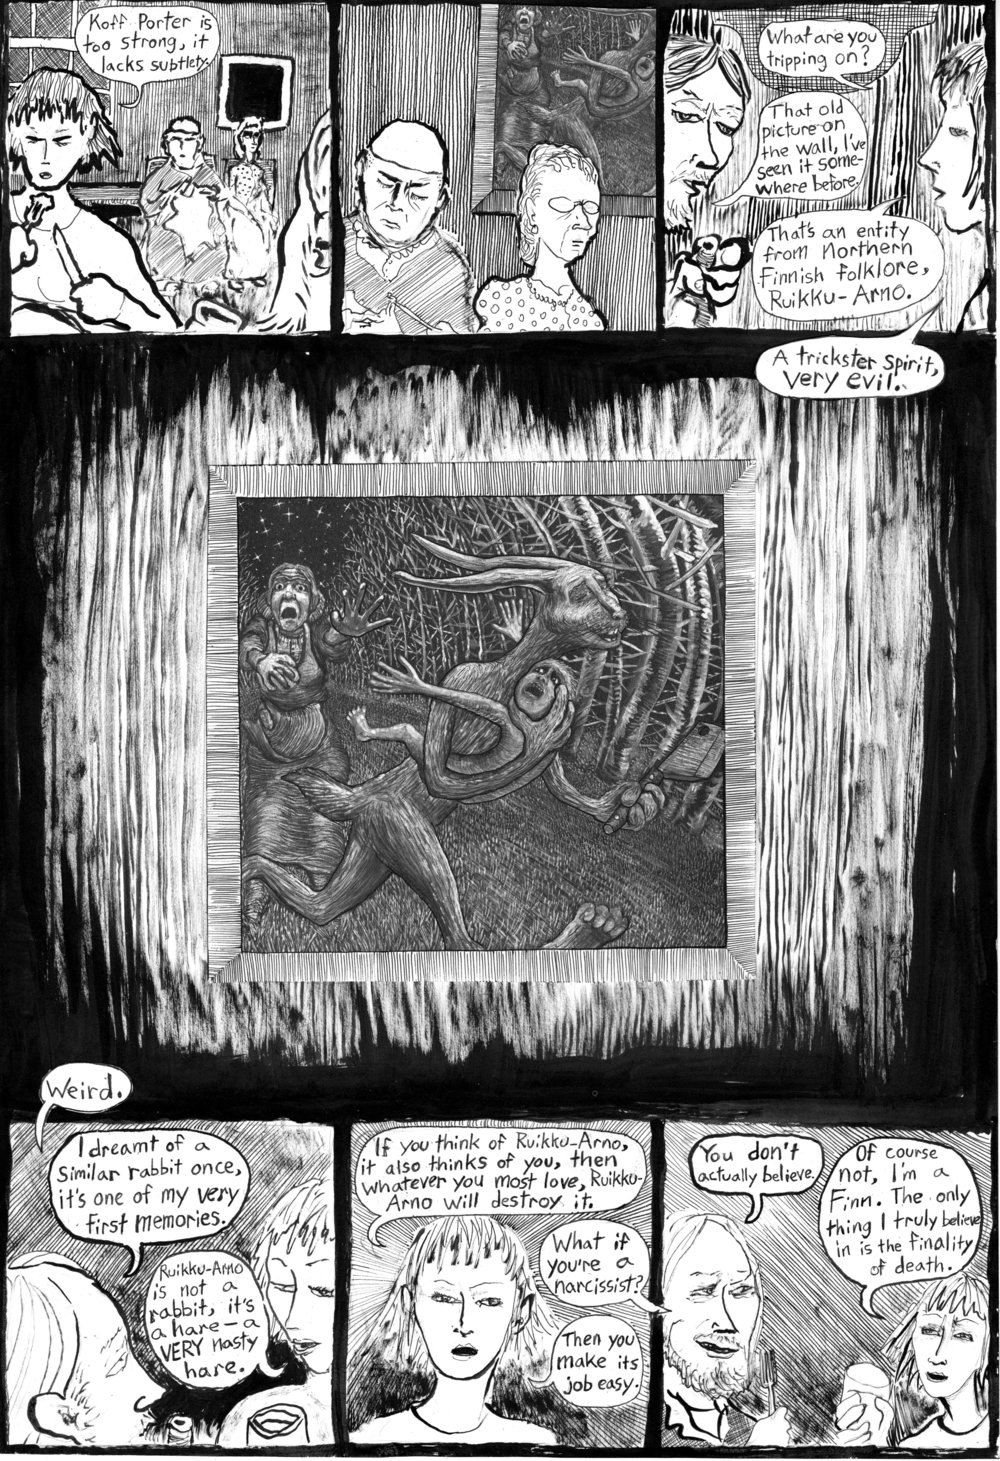 Return of Skinny Arno by morgen eljot 2.jpg